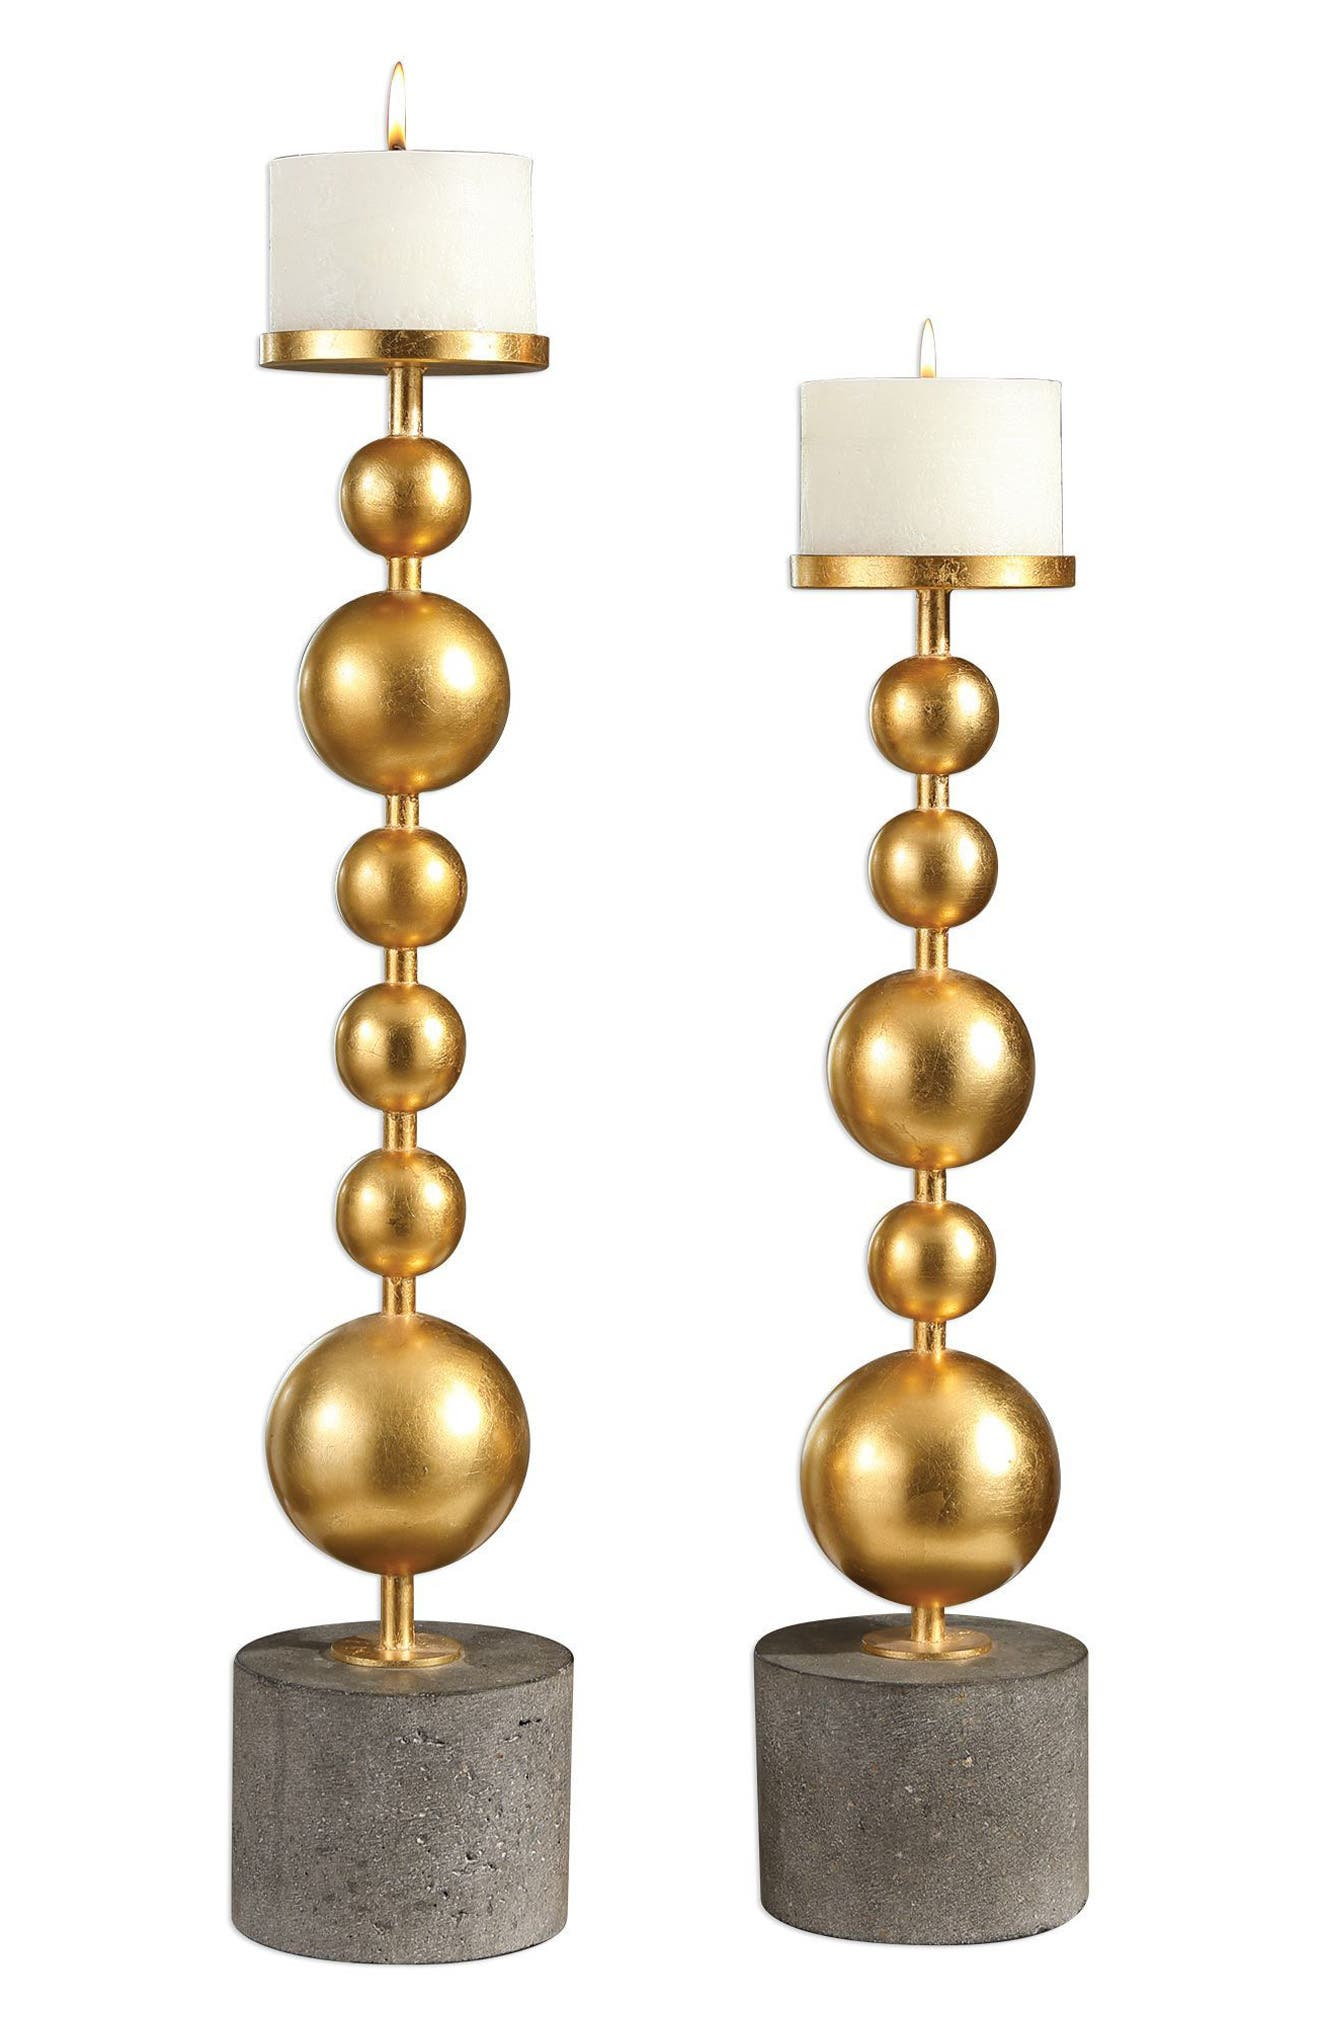 Selim Set of 2 Candleholders,                             Main thumbnail 1, color,                             Metallic Gold